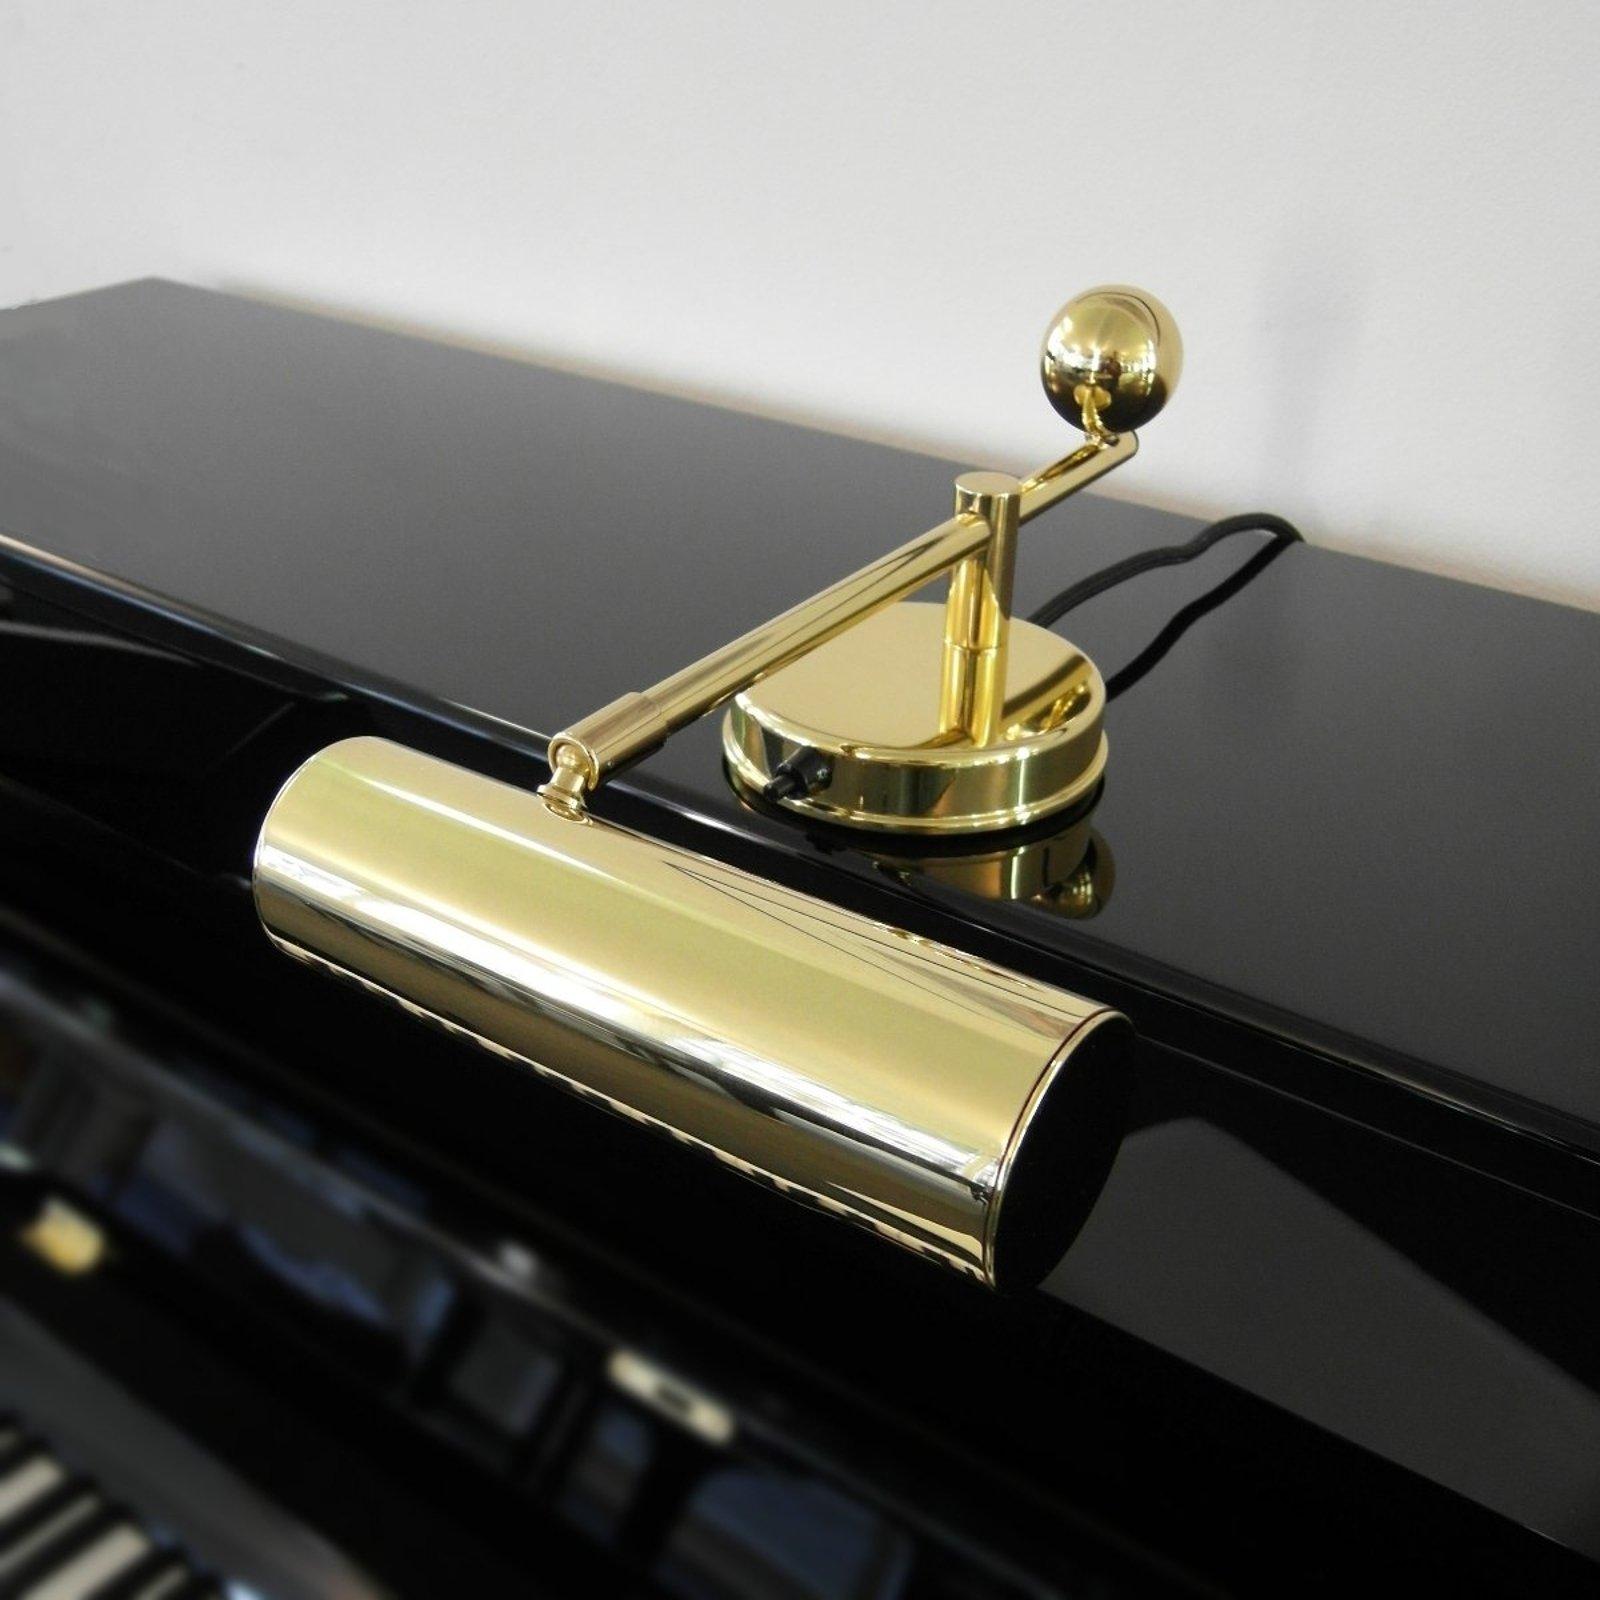 Messing-klaverlampe i De Stijl